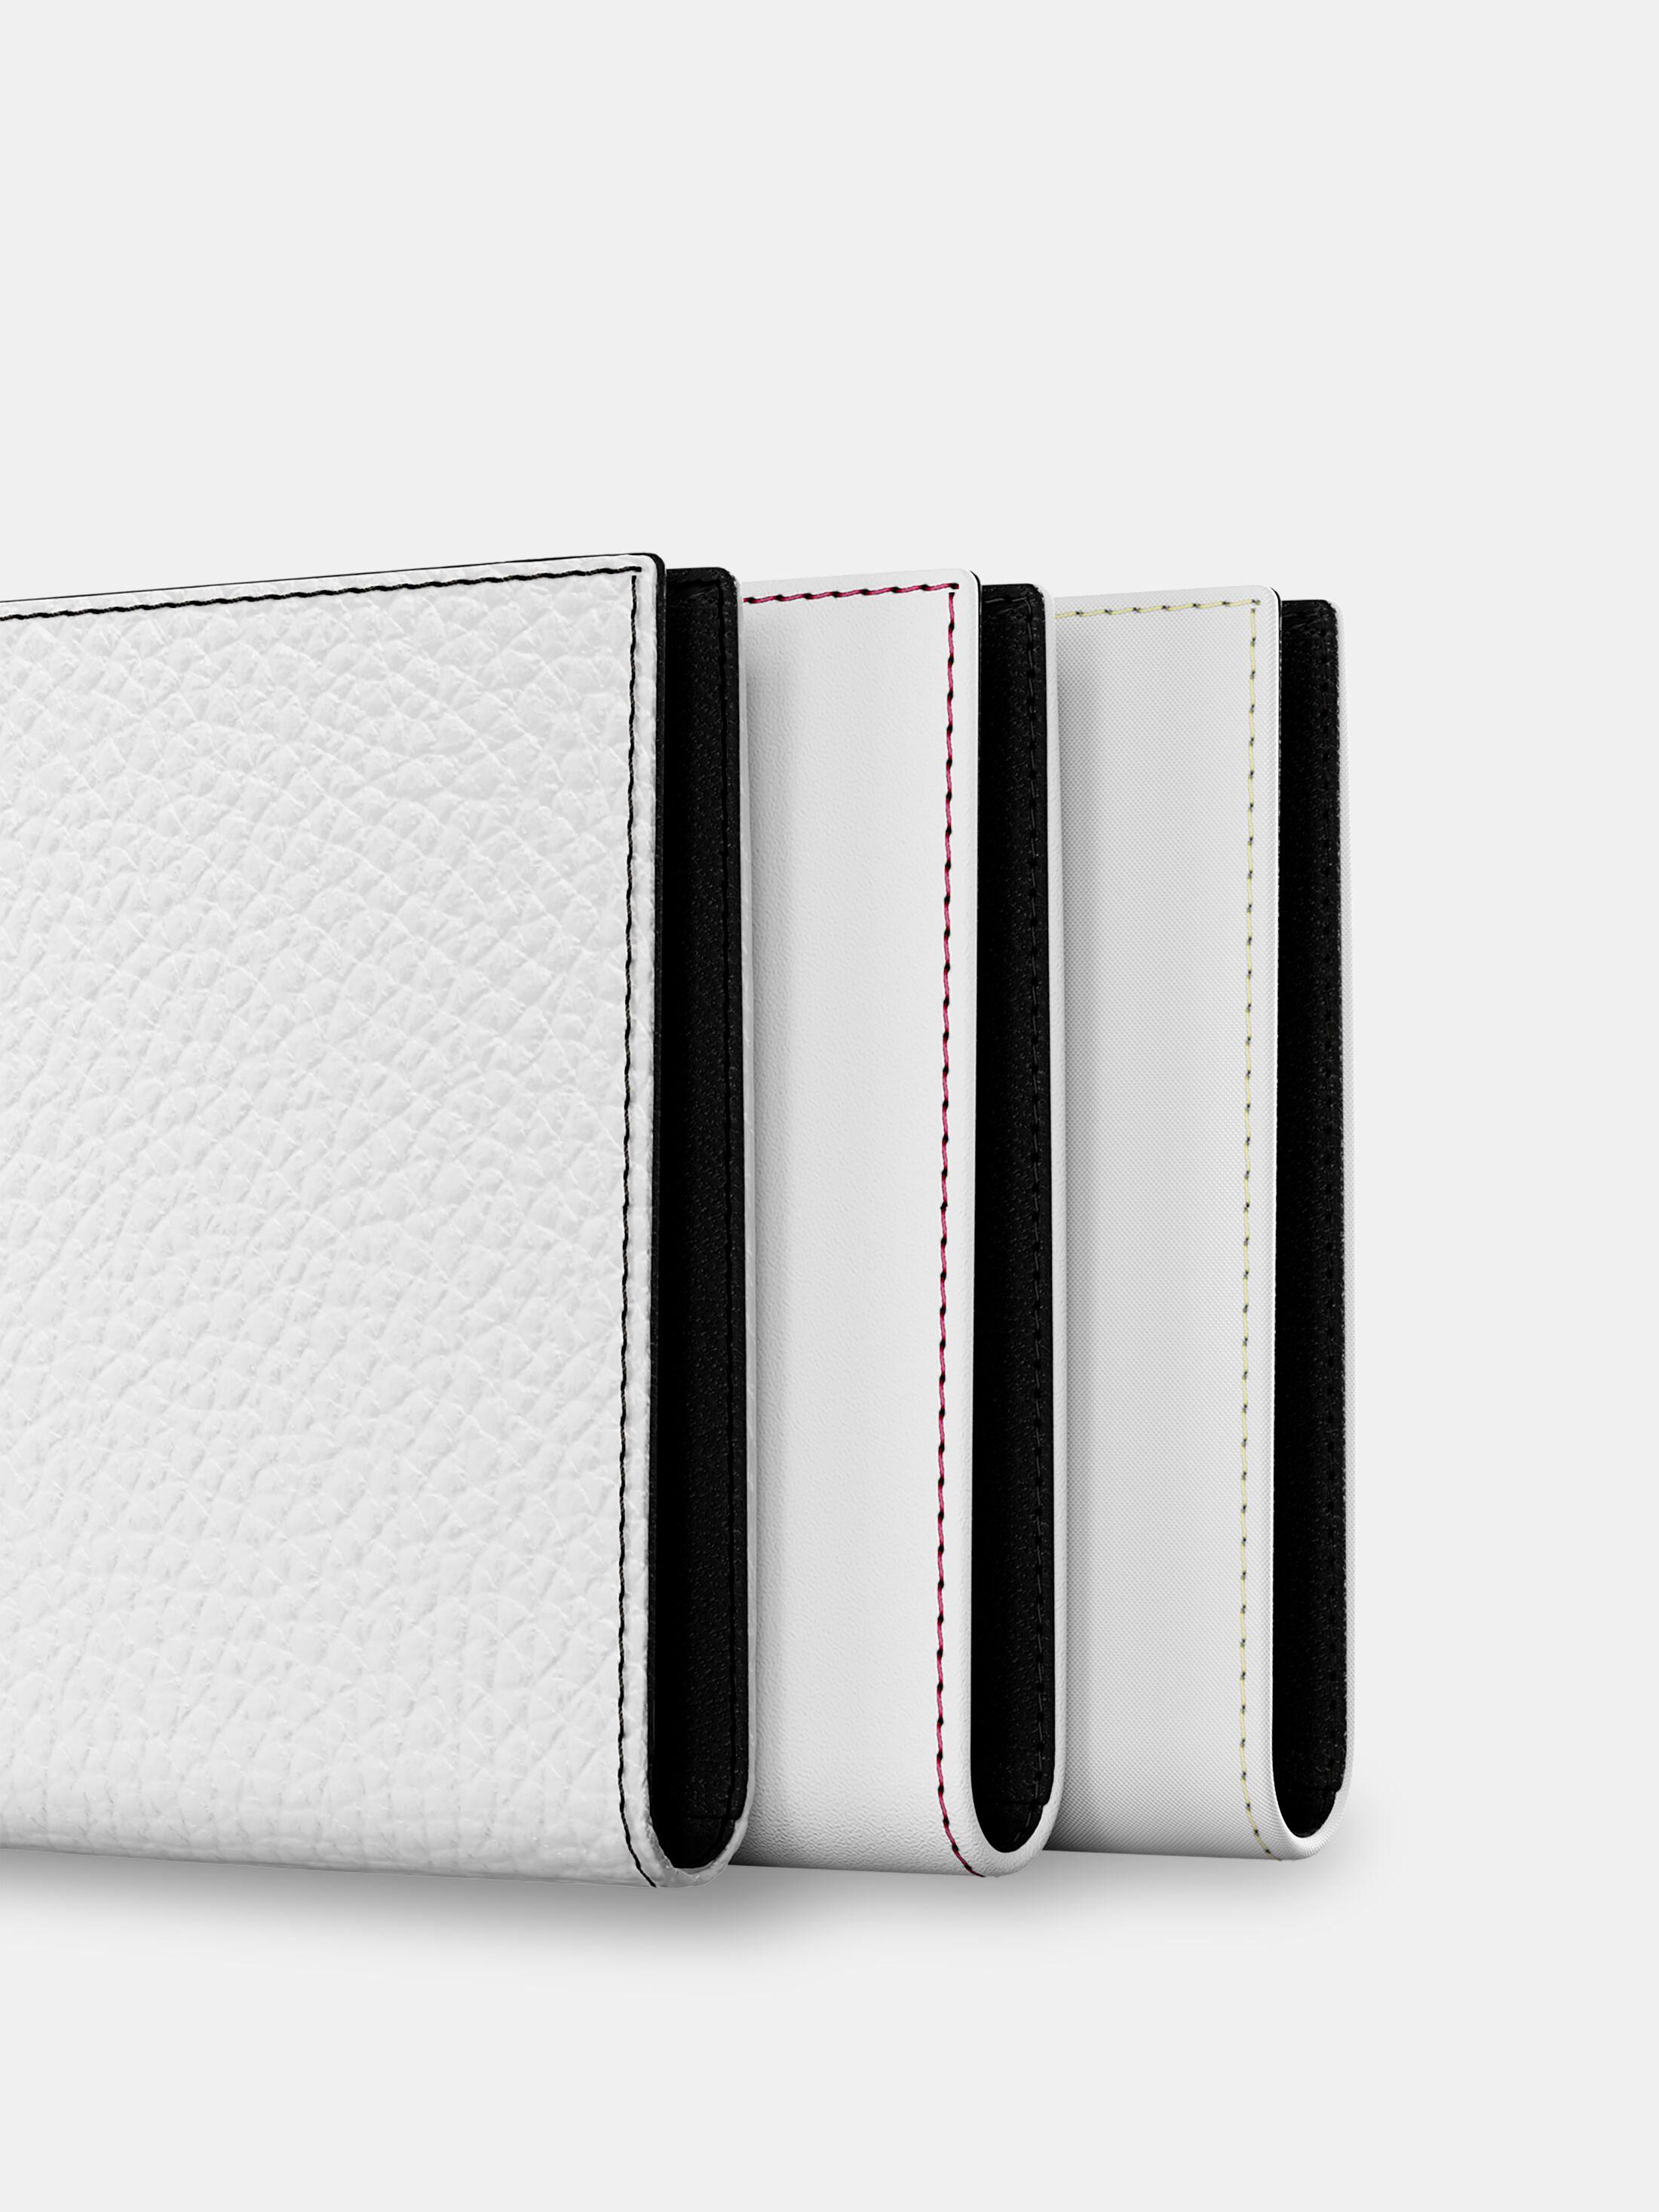 custom travel wallet repeat design